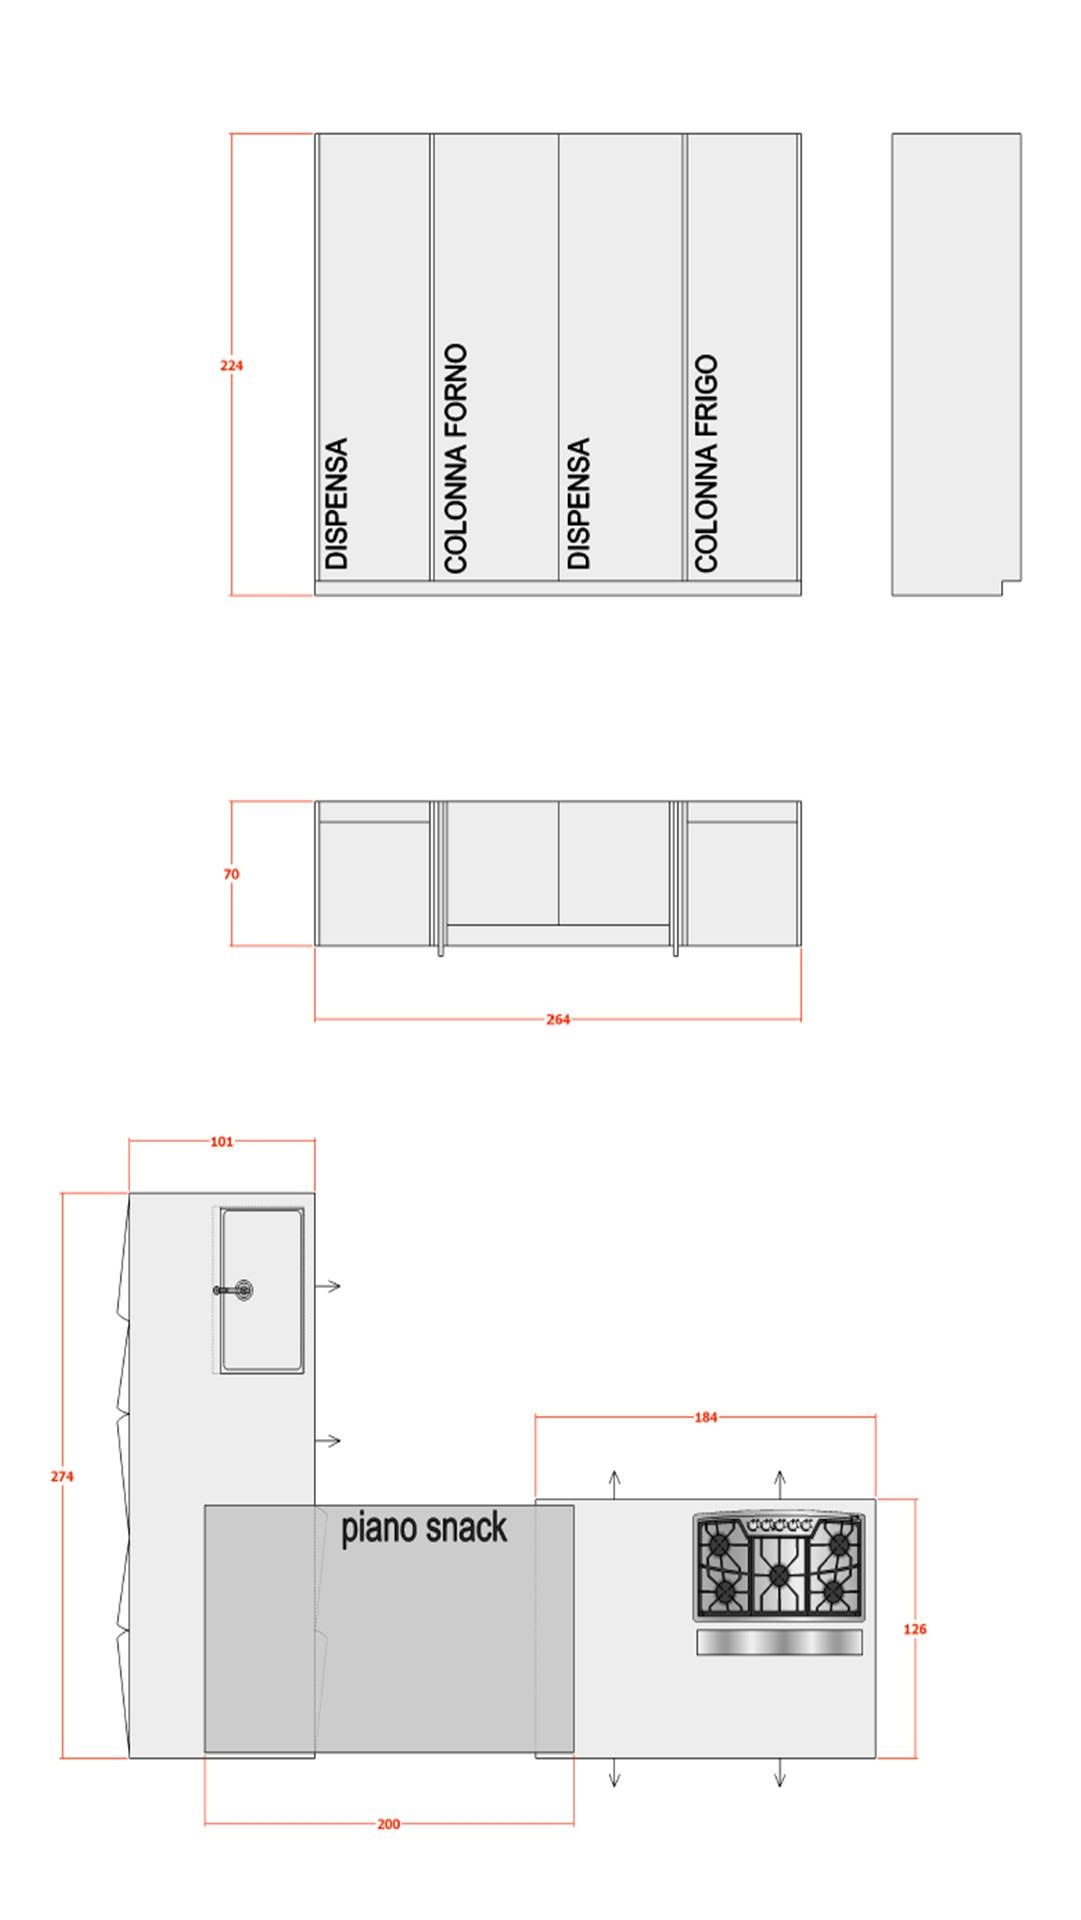 Dimensioni Lavandino Cucina Perfect Misure Standard Mobili Cucina